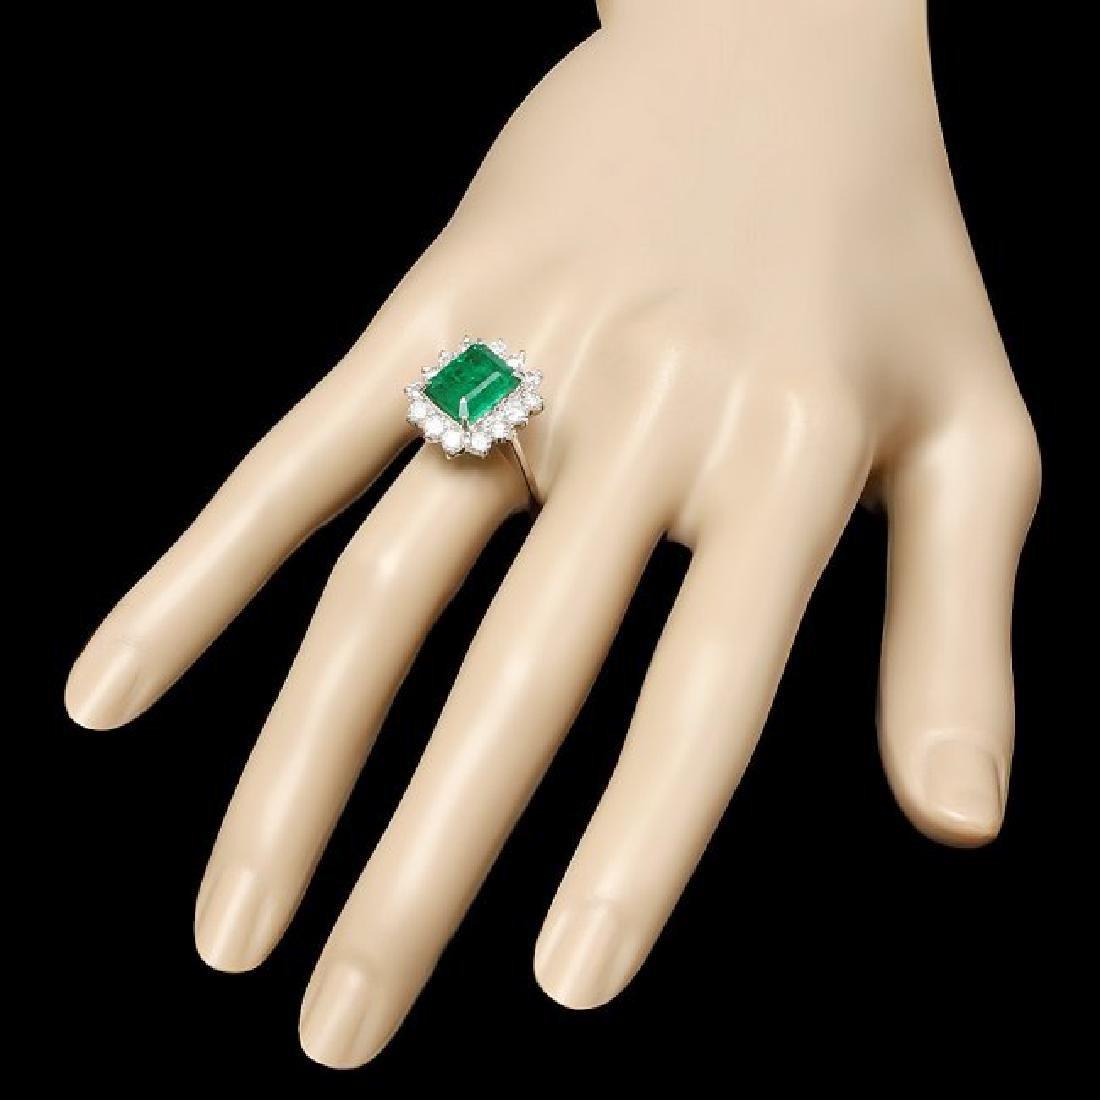 14k White Gold 3.13ct Emerald 1.35ct Diamond Ring - 3